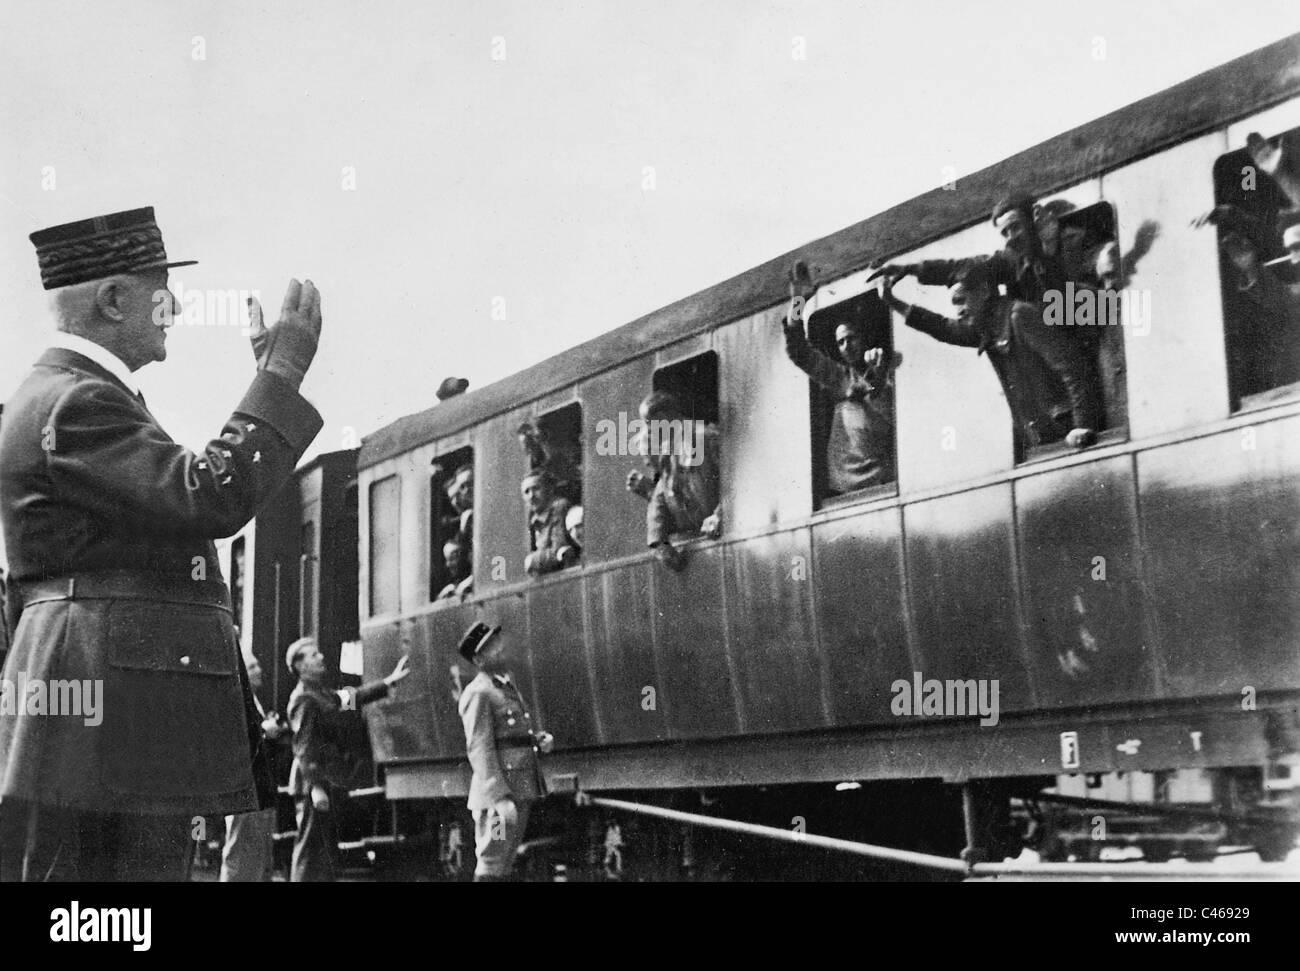 Henri Philippe Petain welcomes returning prisoners of war, 1941 - Stock Image